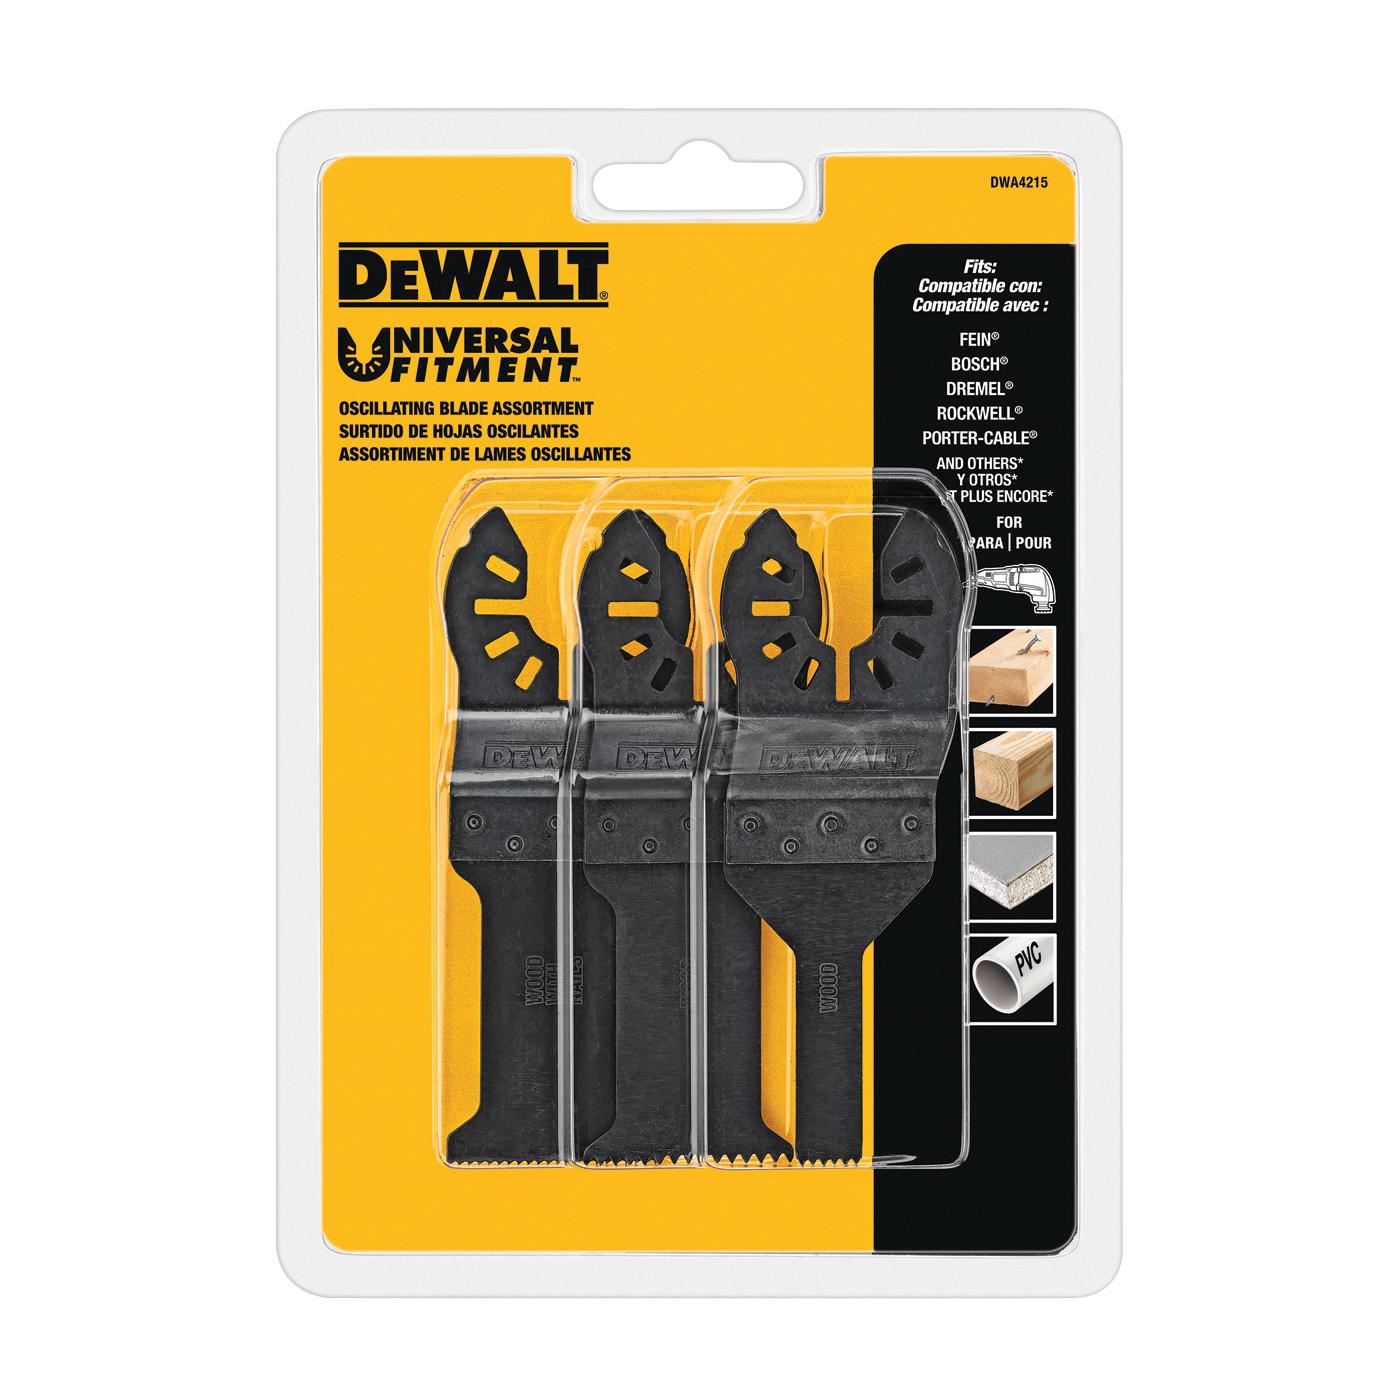 DeWALT DWA4215